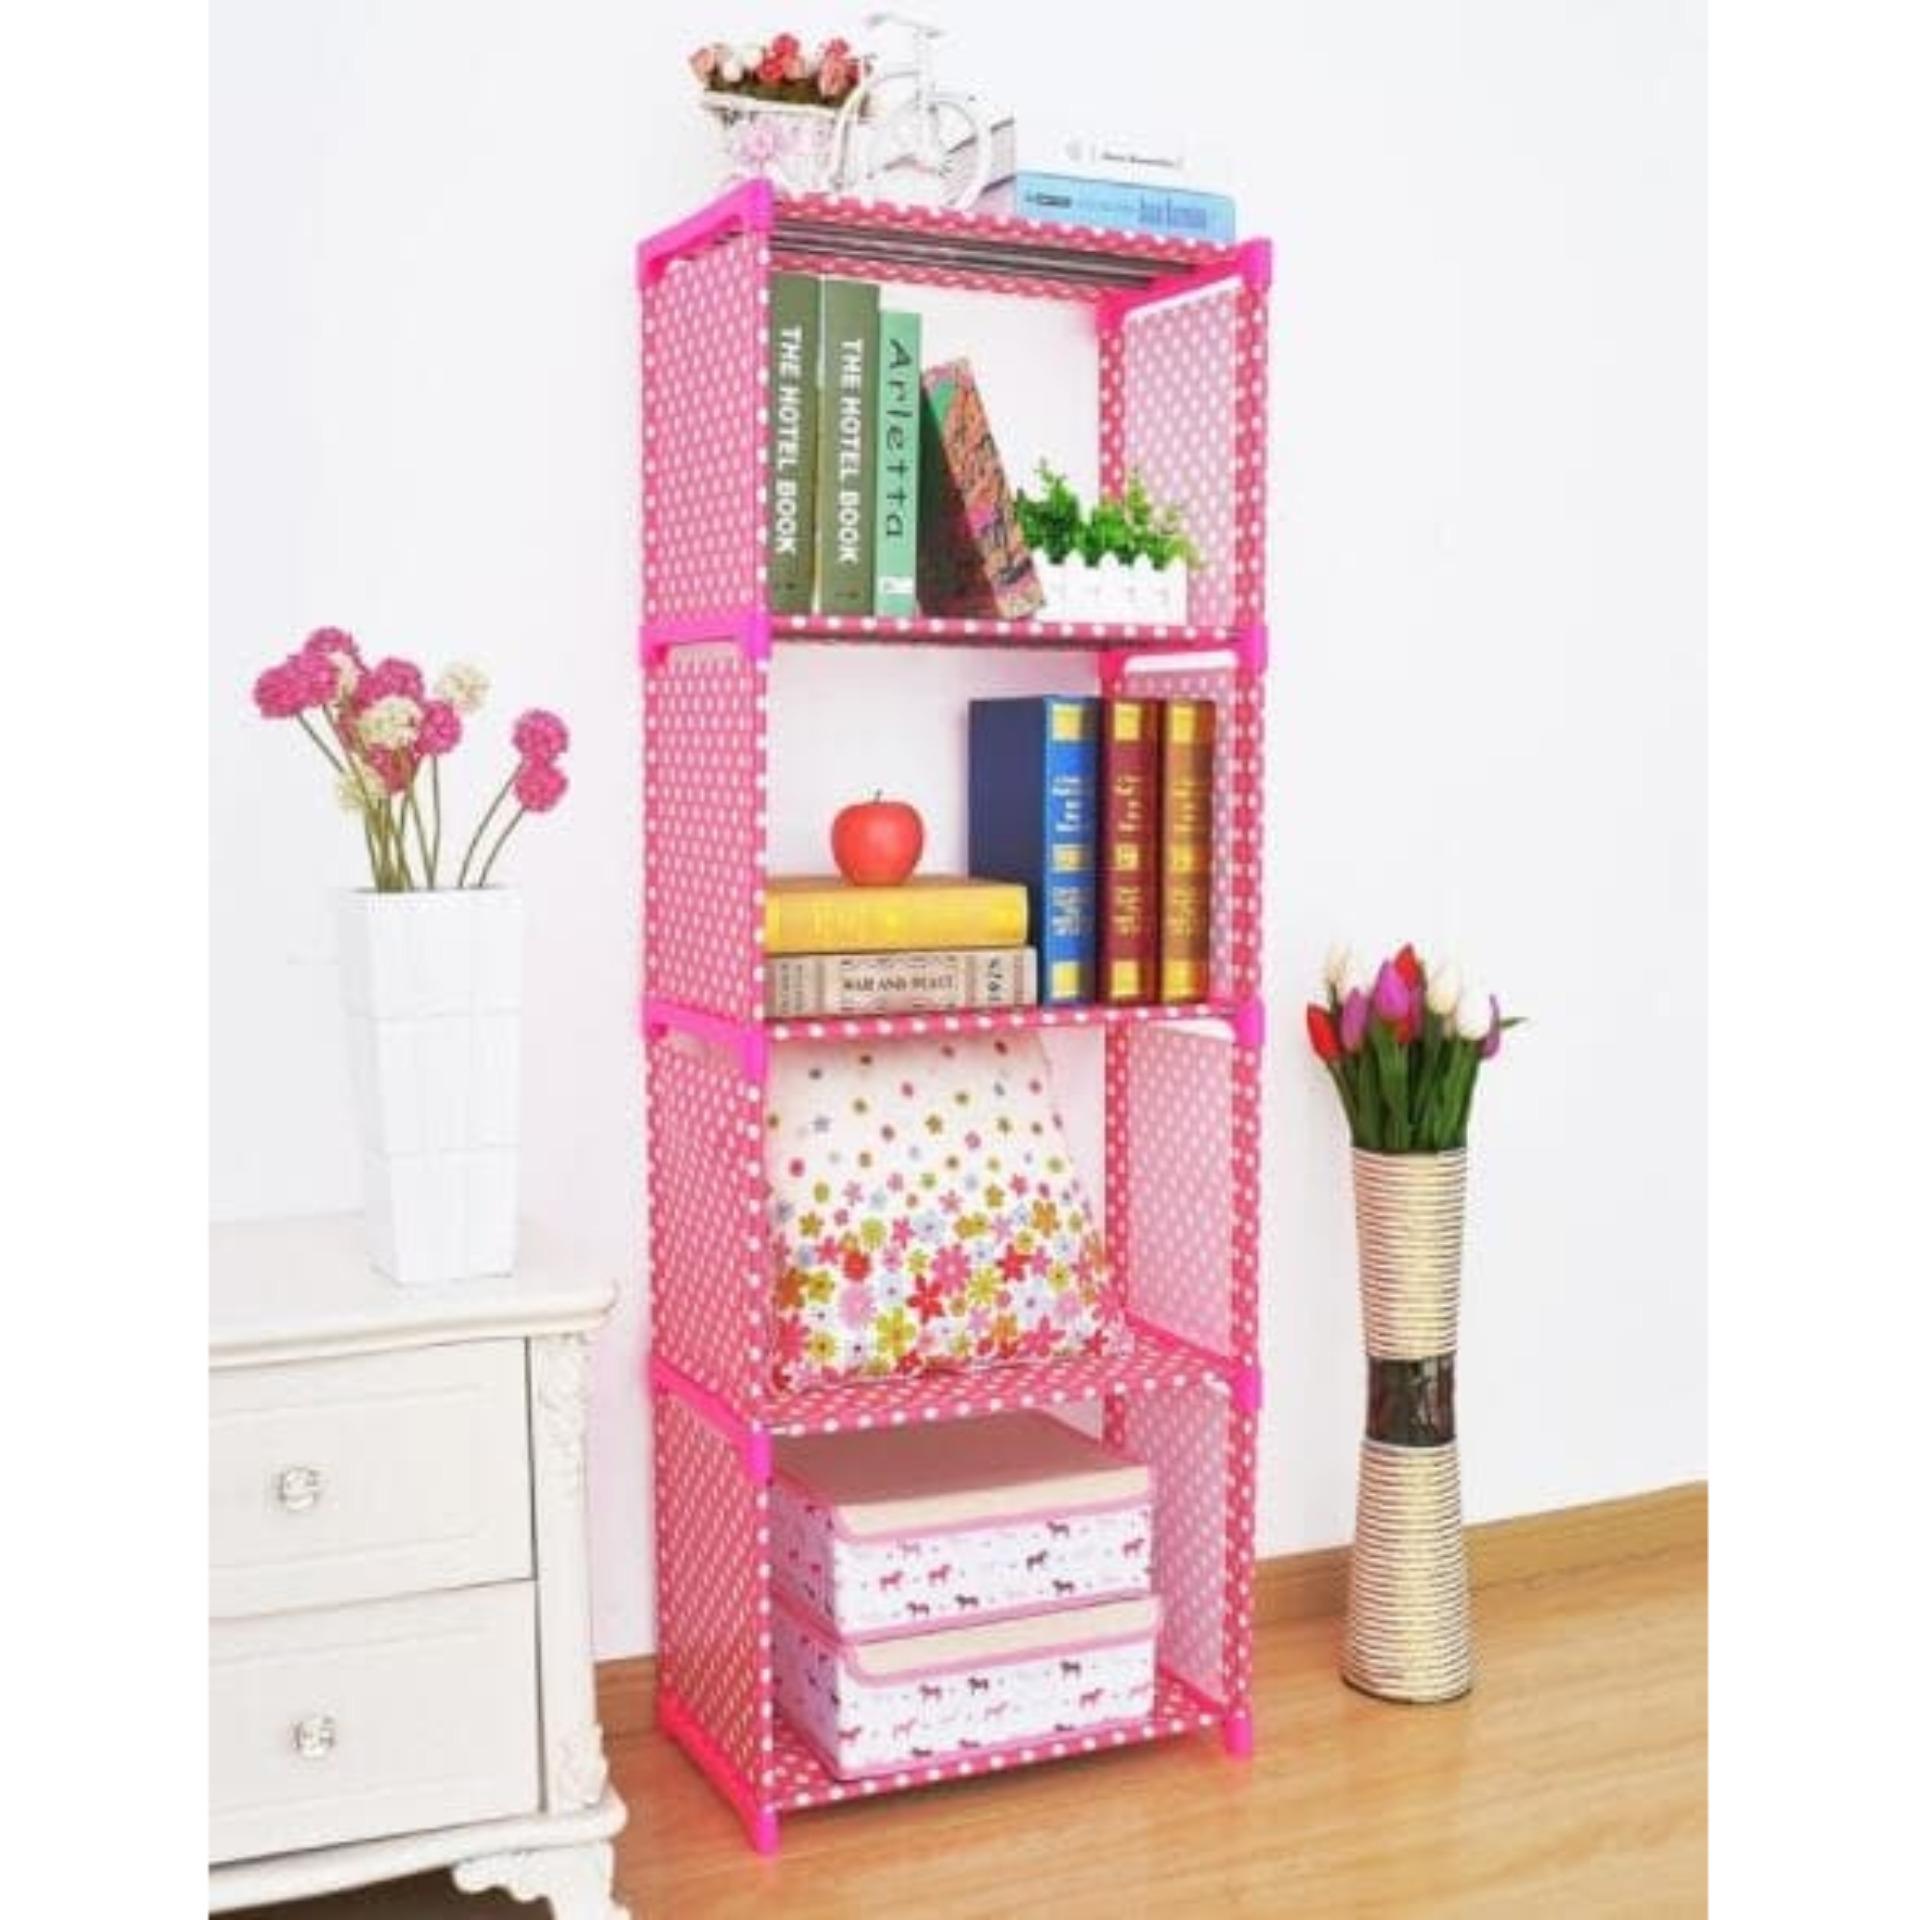 Harga Rak Portable Serbaguna 5 Susun 4 Ruang Pink Polkadot Rak Buku Online